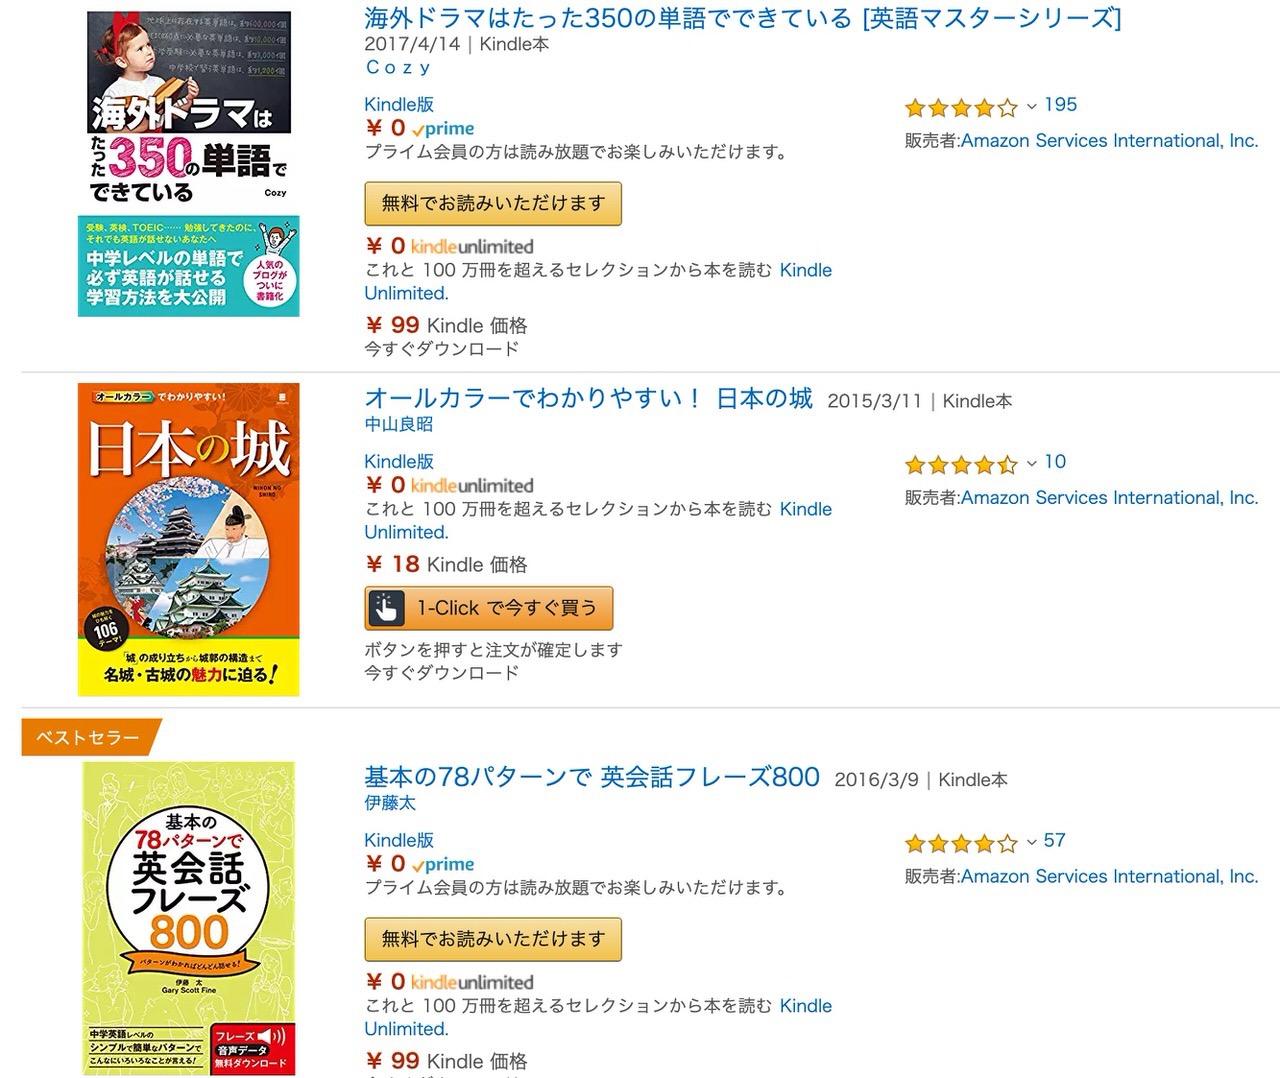 【Kindleセール】令和(018)記念!西東社の18円&99円キャンペーン(5/12まで)